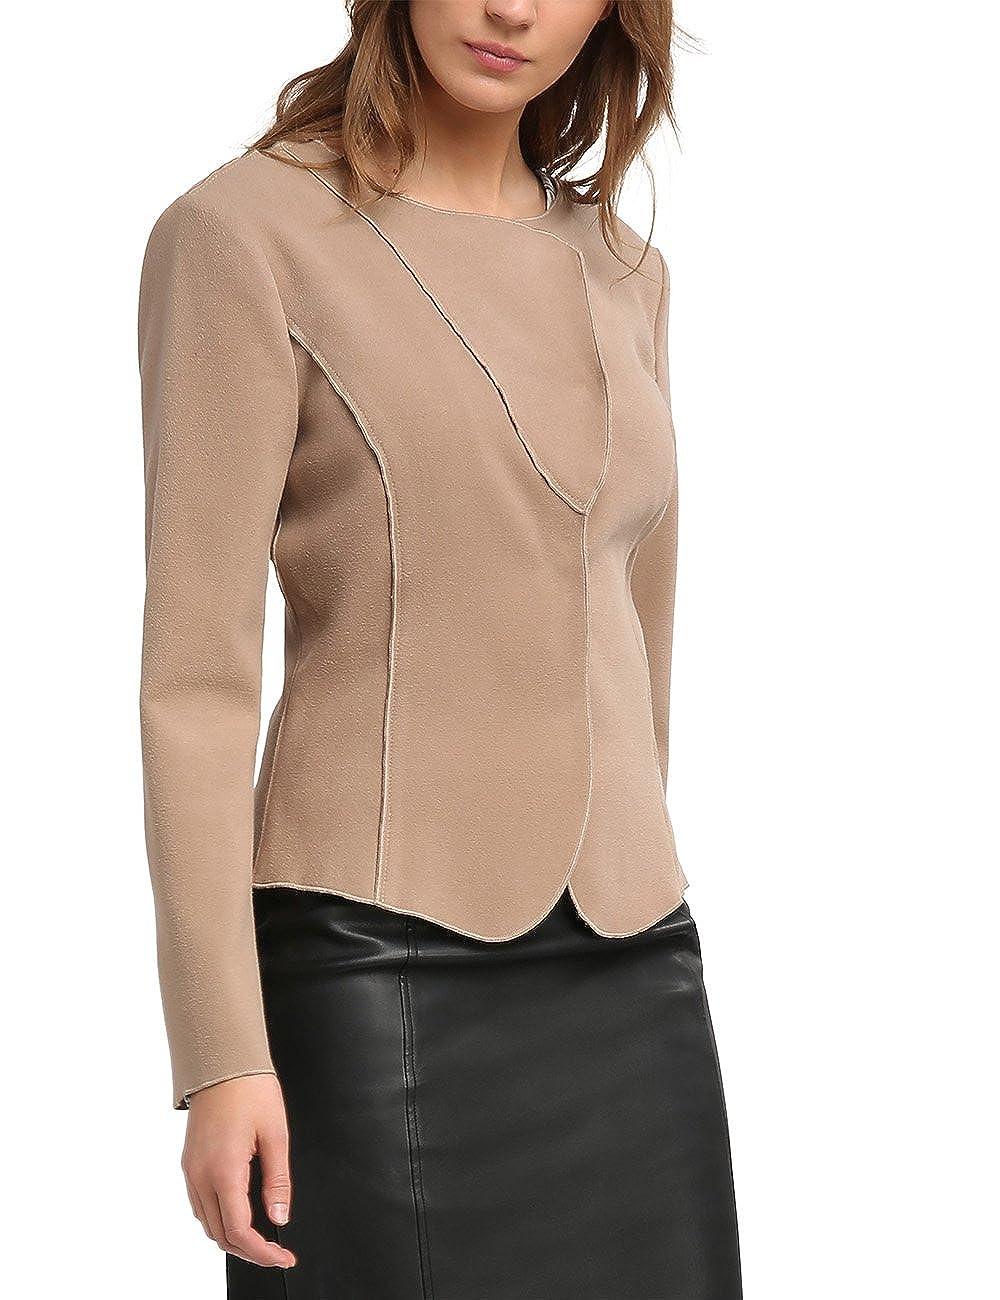 APART Fashion Damen Bolero 45212